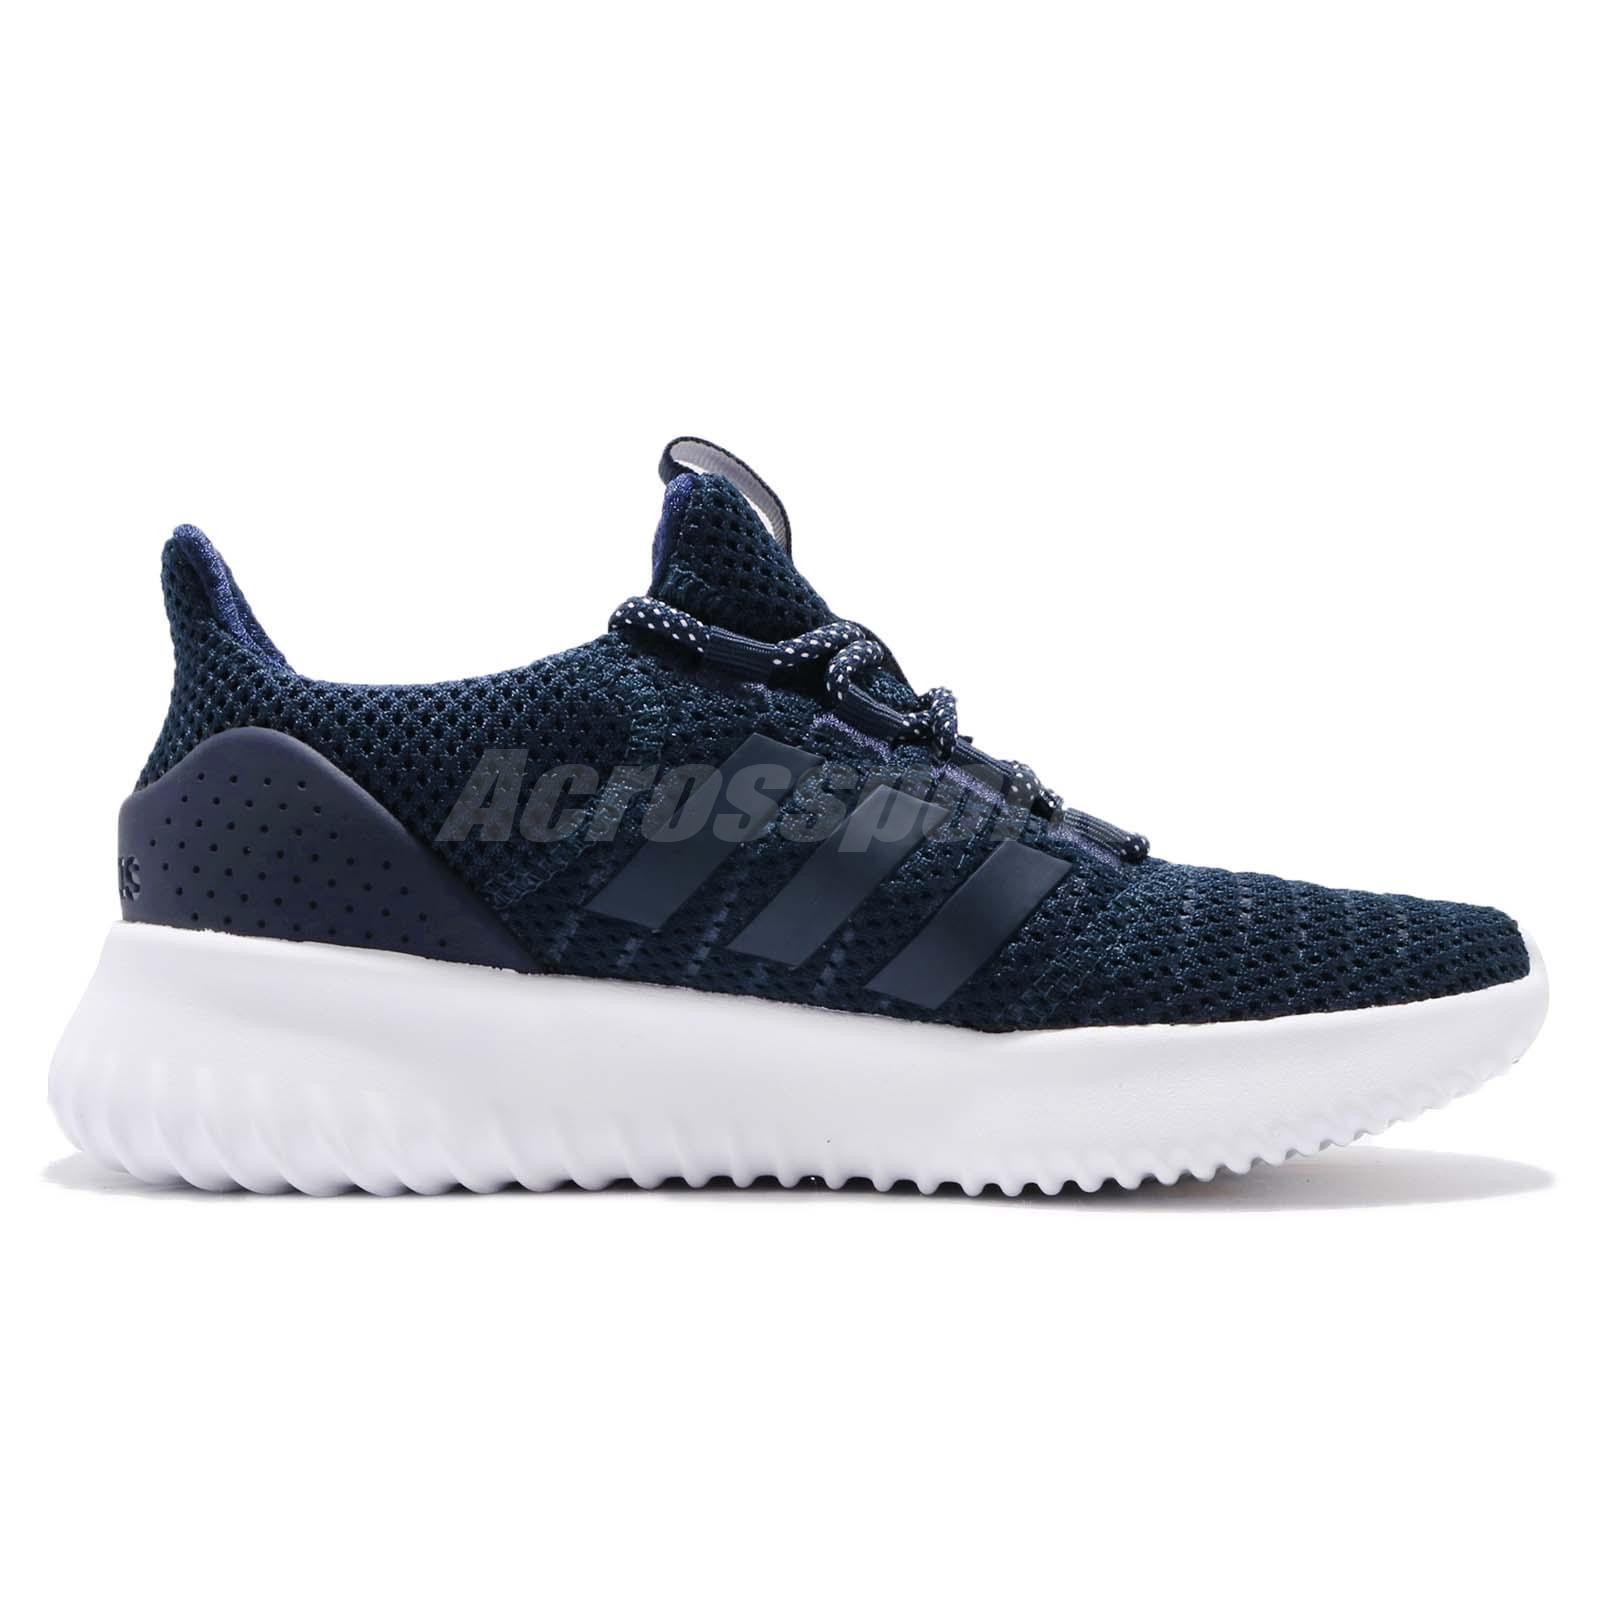 adidas Cloudfoam Ultimate Core Navy White Women Running Shoes ... 41c48576a